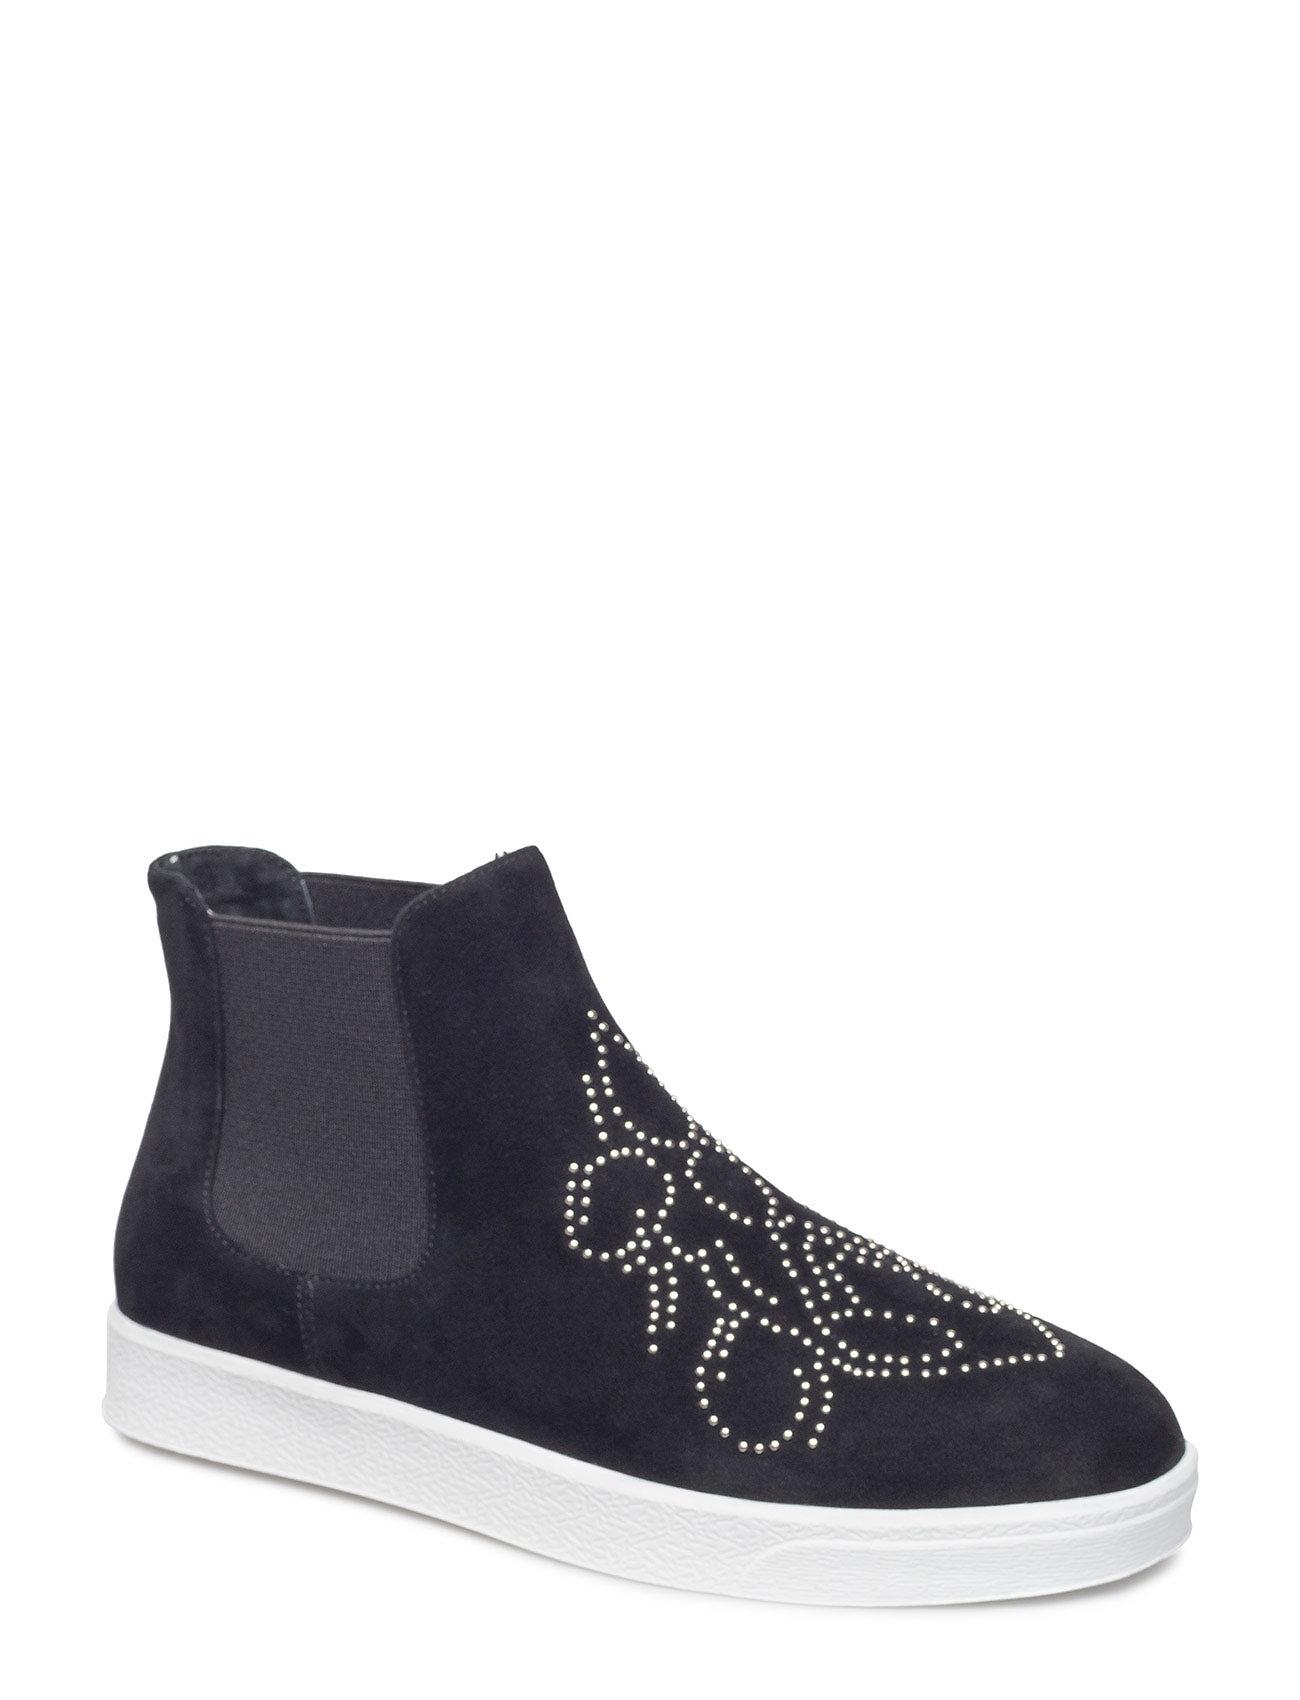 5d0d6b311dce Sofie Schnoor Boot Loafer (Black)